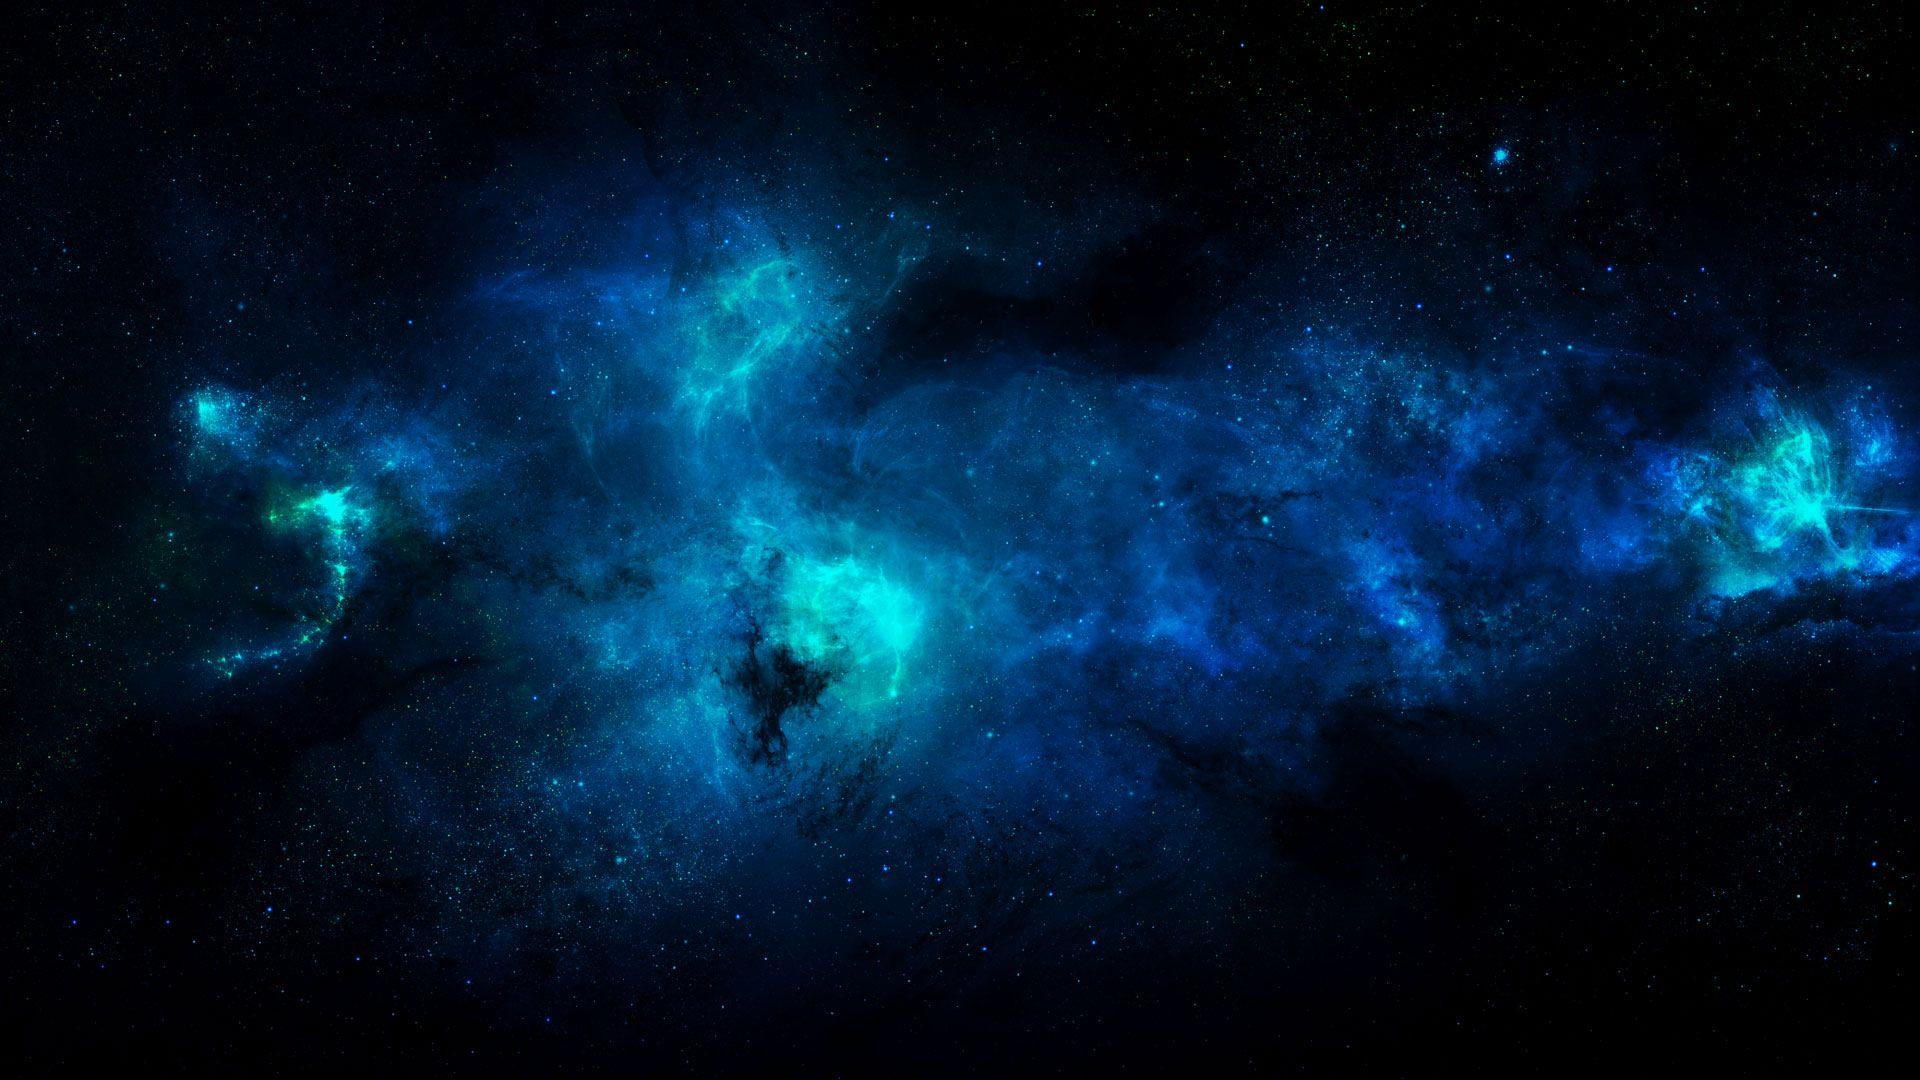 Blue Space Nebula Wallpaper Kosmos